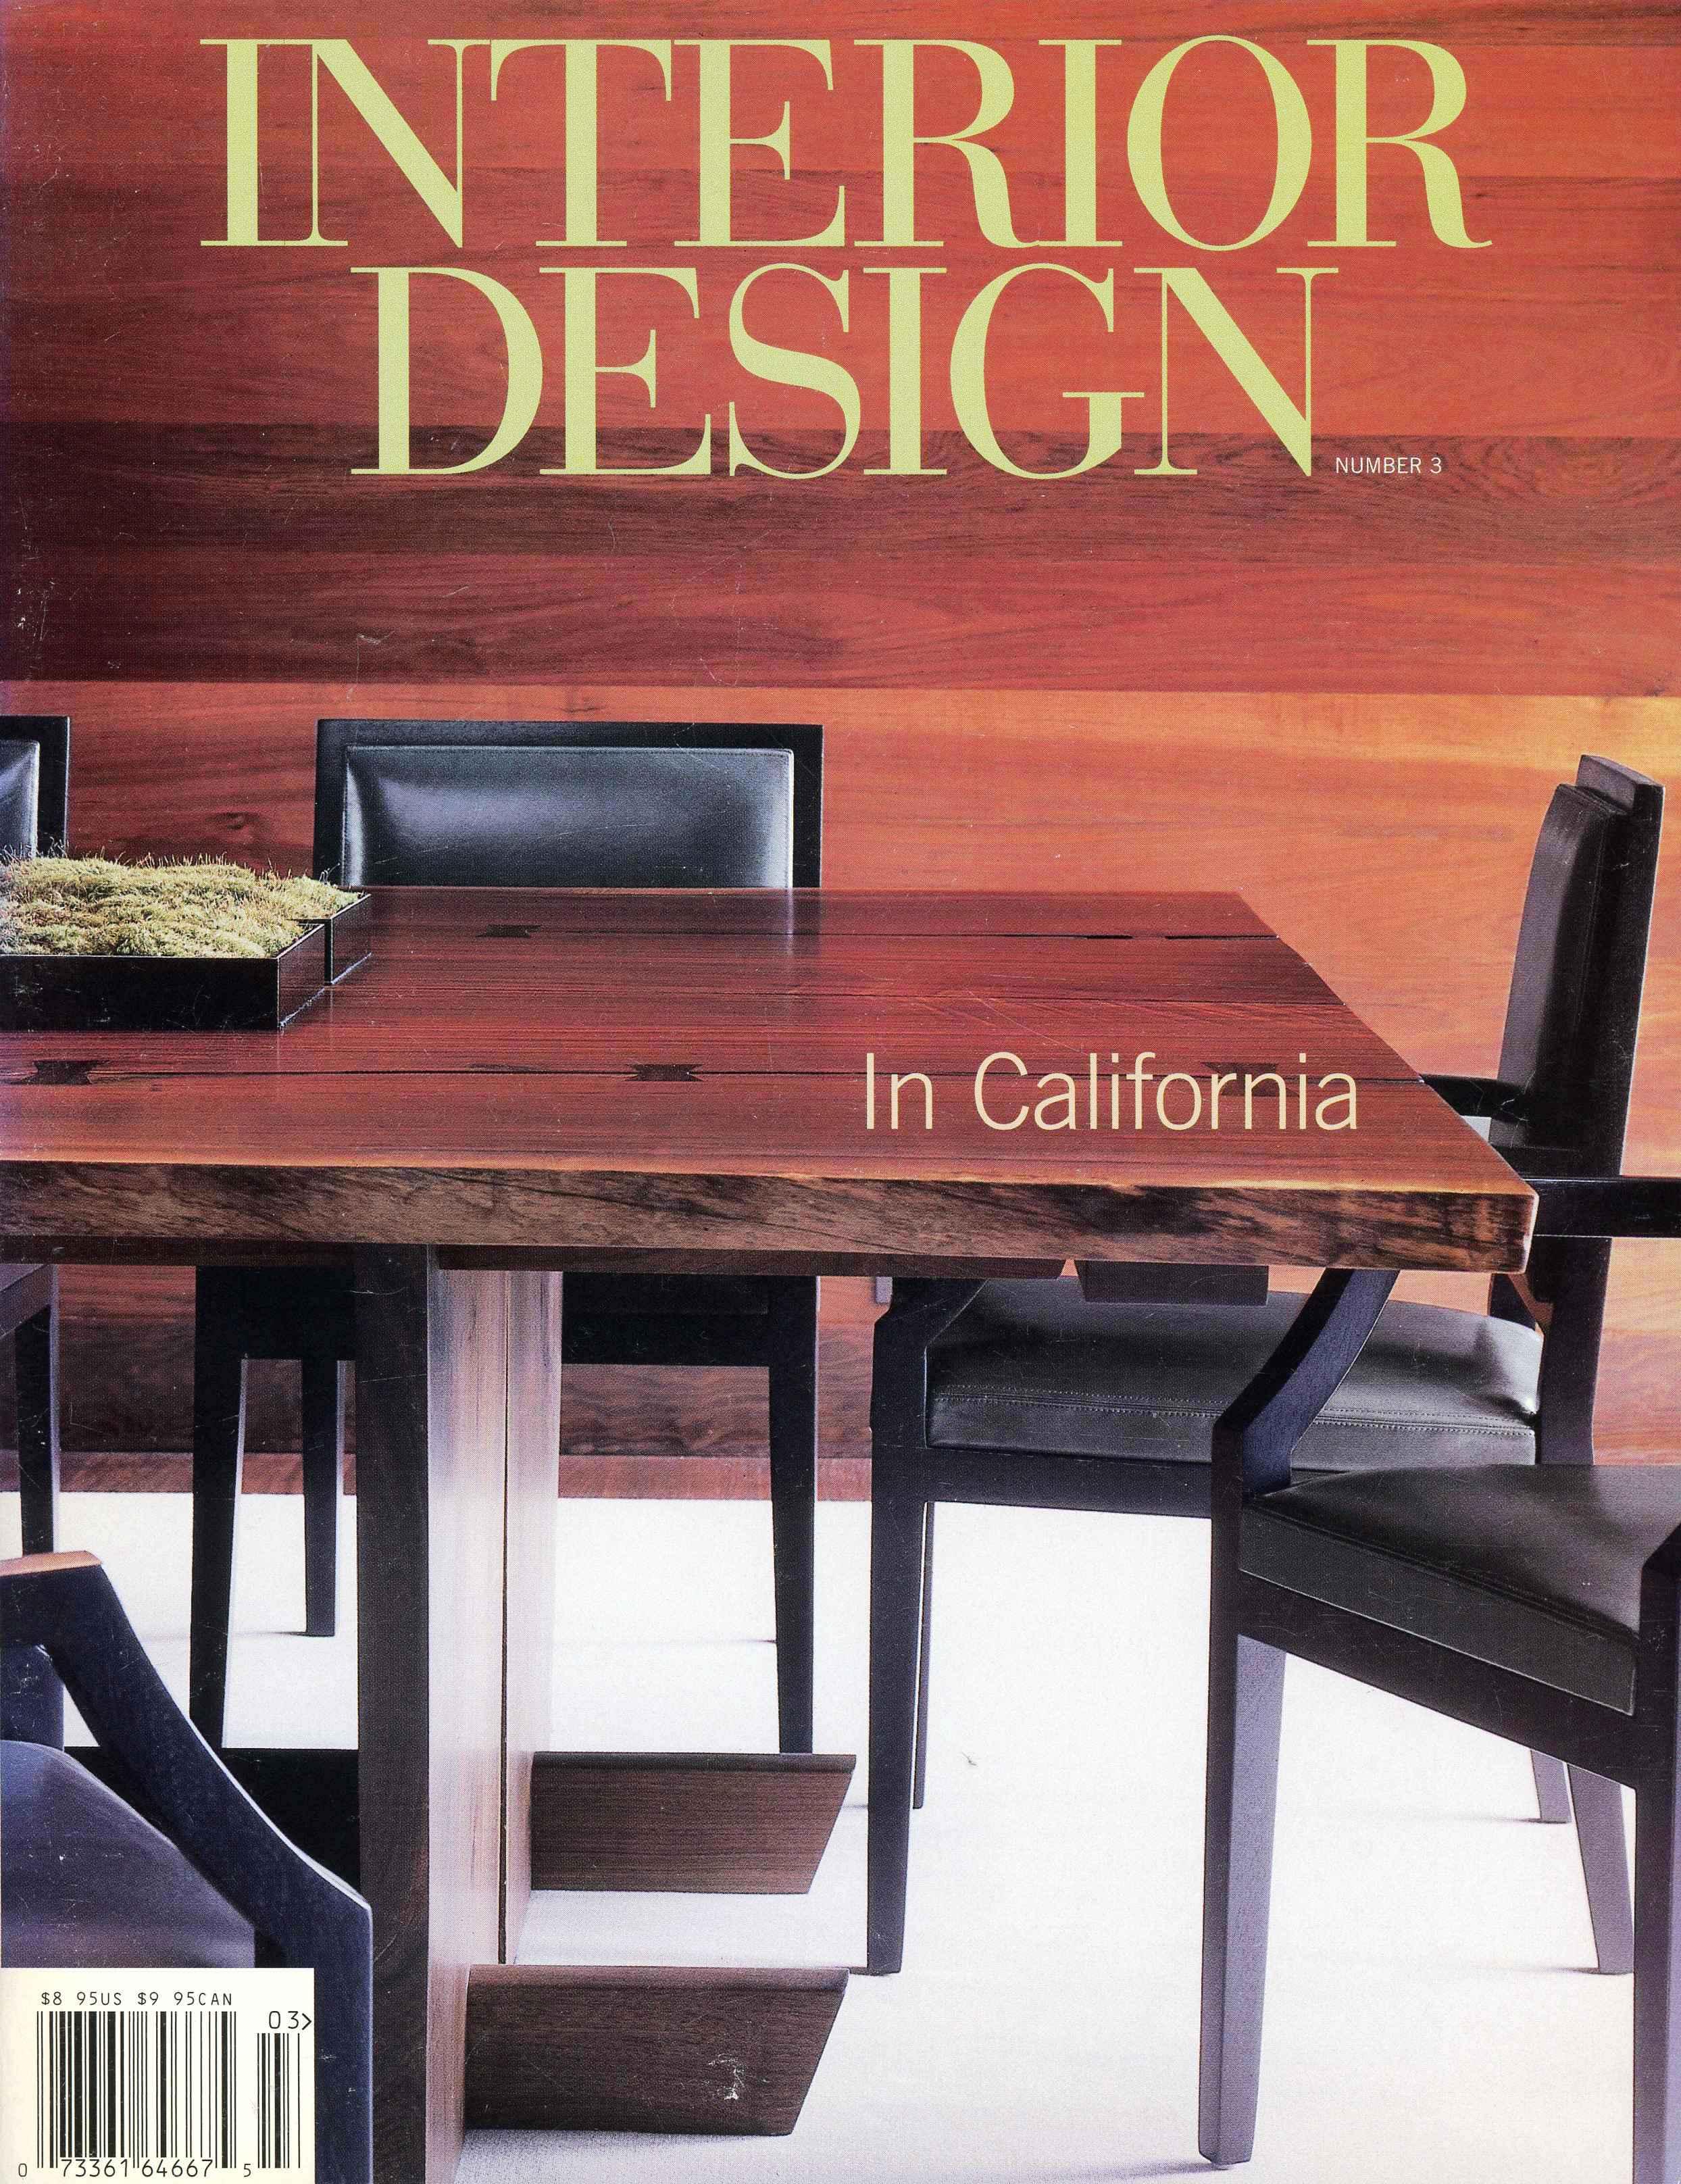 Int Design_Mar 02 Cover.jpg